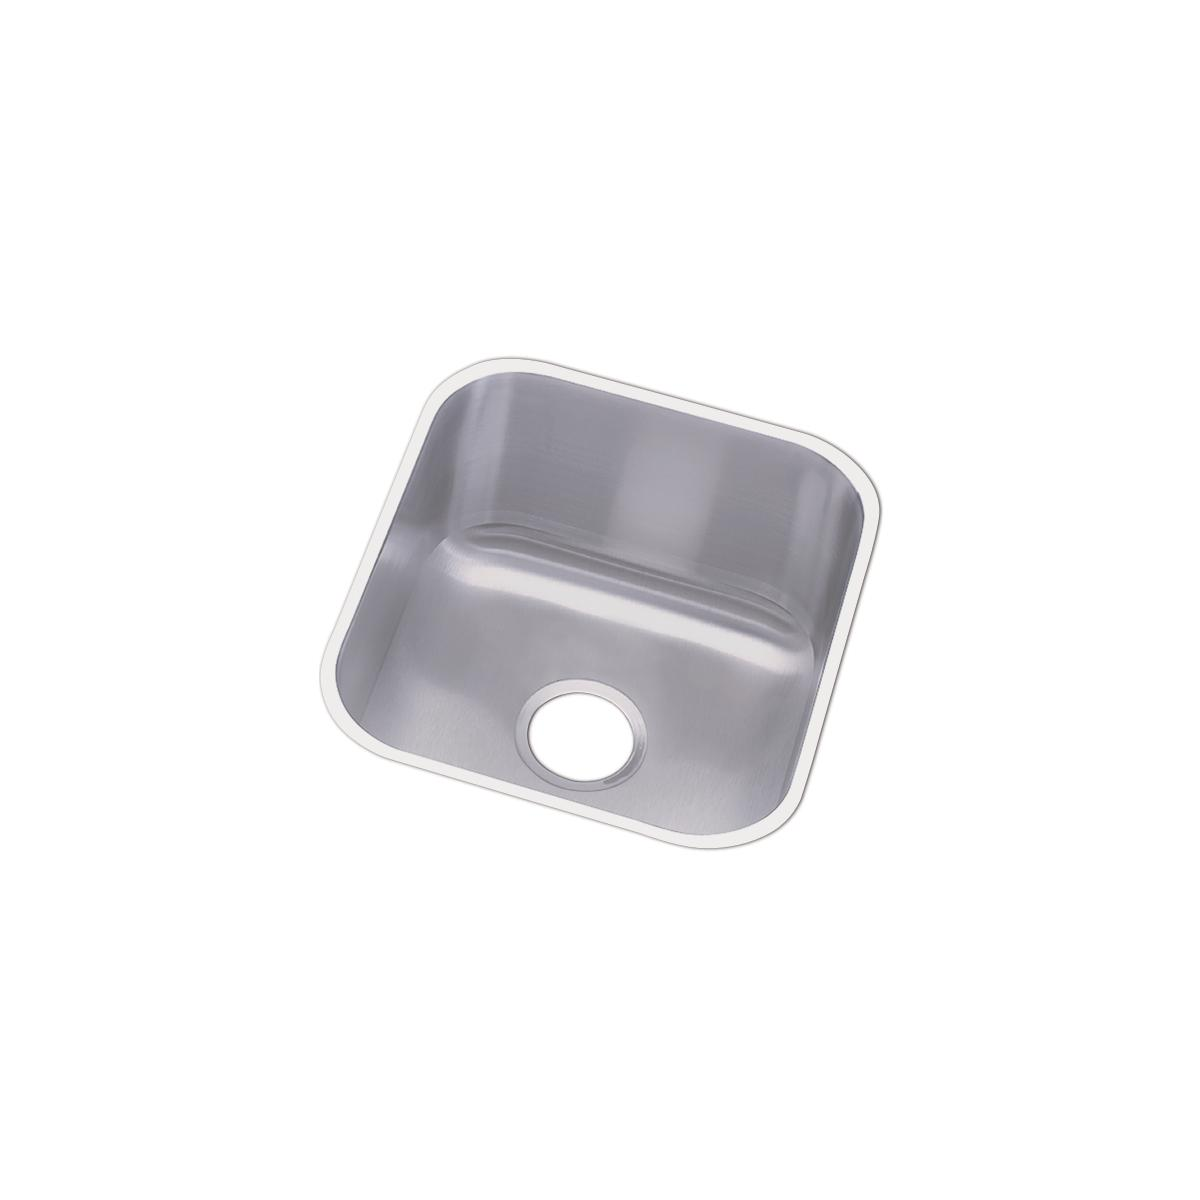 18 gauge stainless steel 16 5 x 18 25 x 8 single bowl undermount bar prep sink